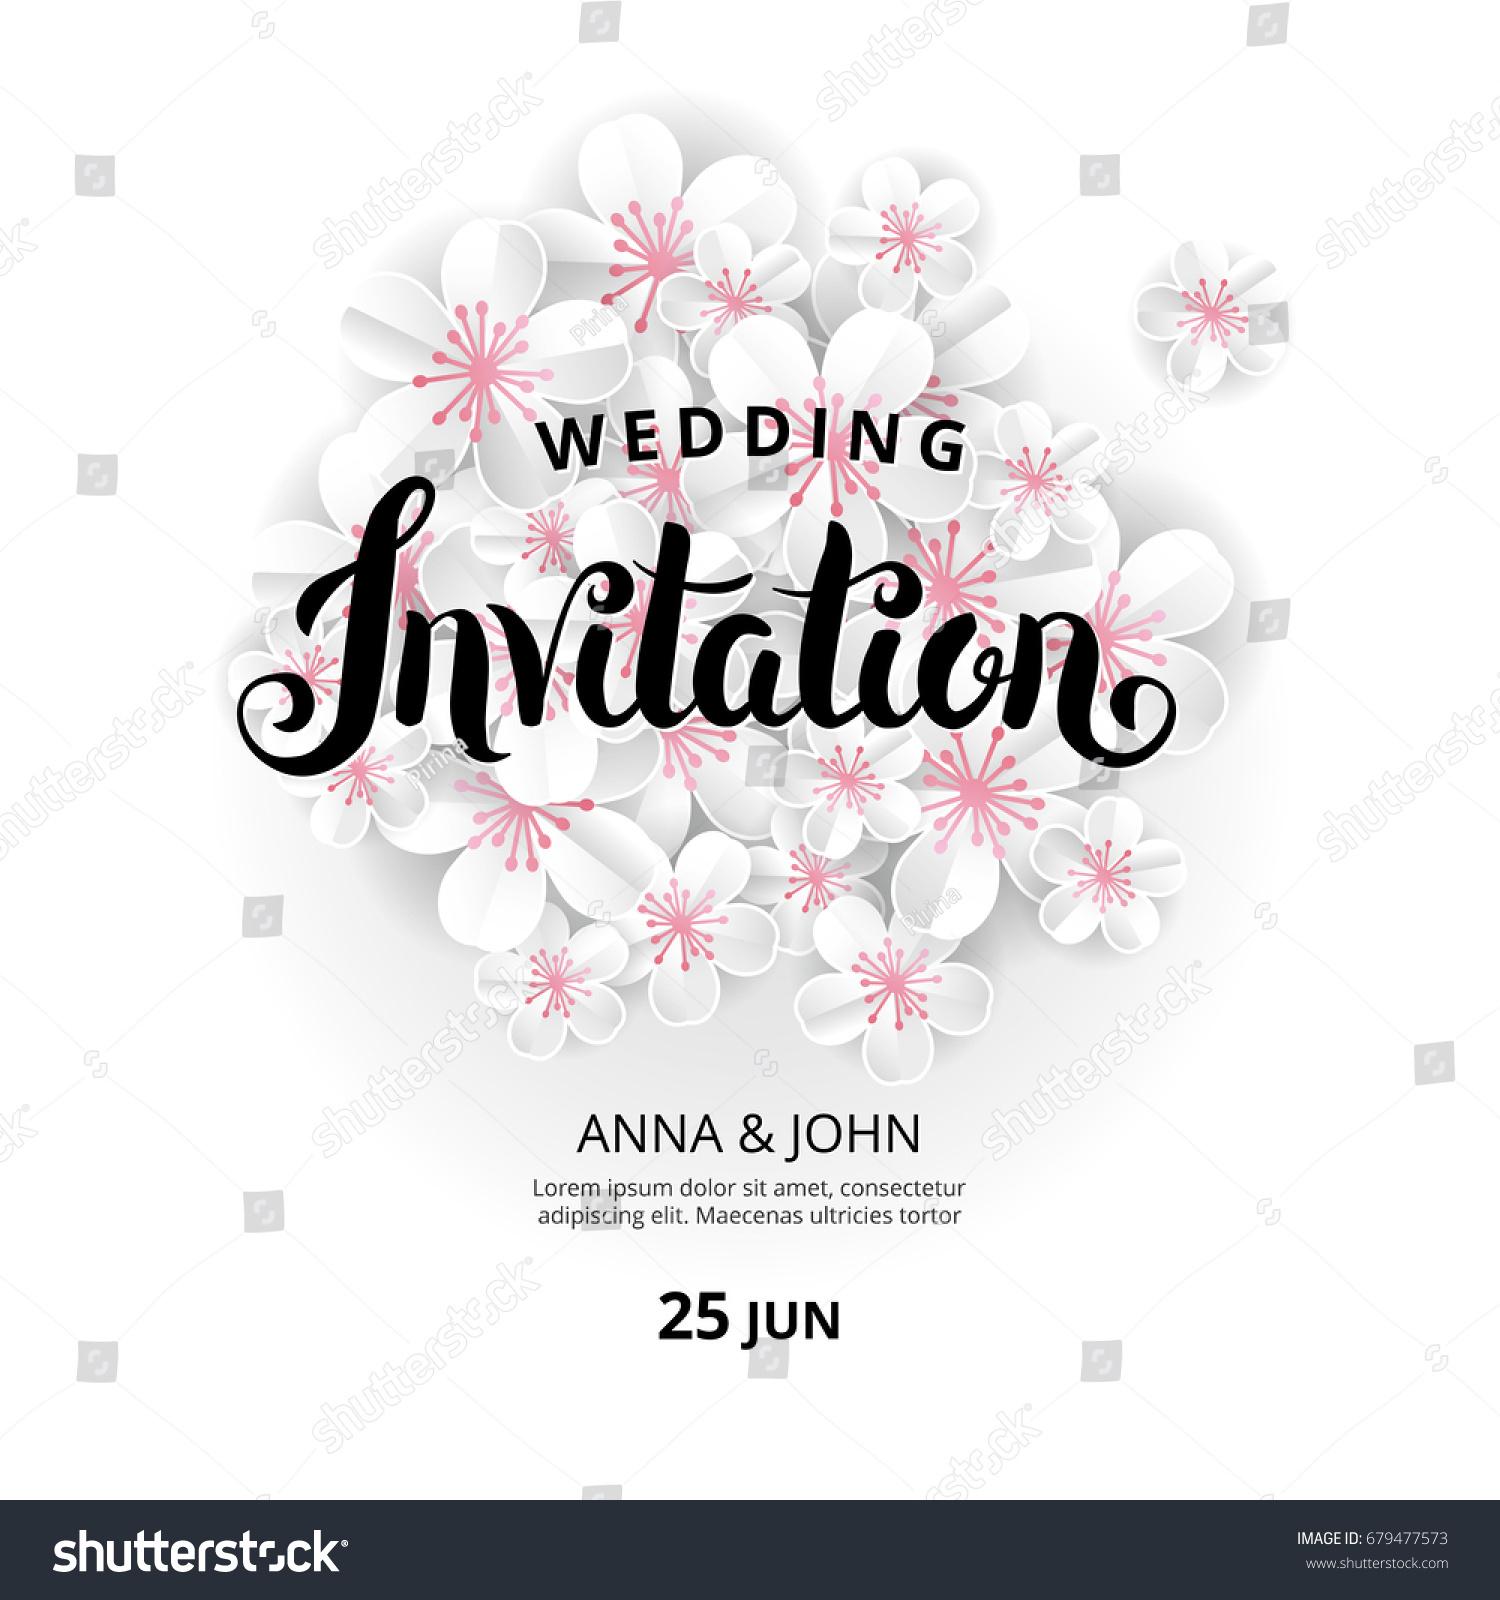 White Flowers Invitation Wedding Banner Paper Stock Vector HD ...